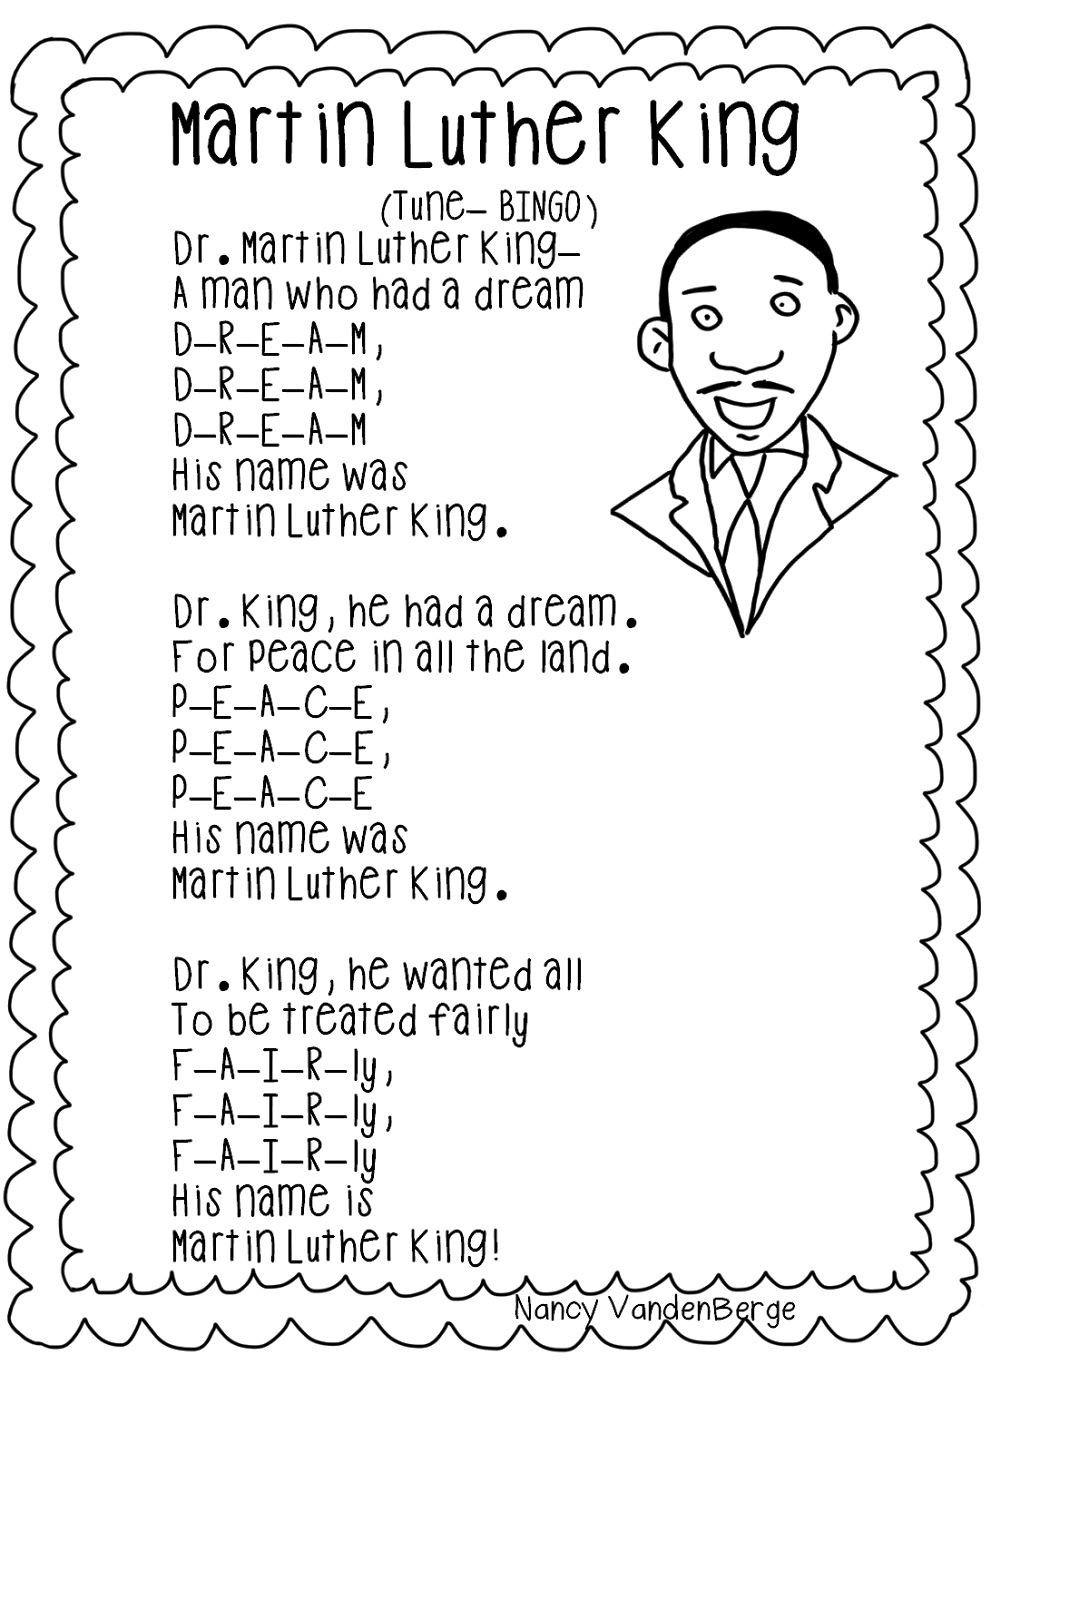 First Grade Social Studies Worksheets In 2020 Martin Luther King Jr Activities Martin Luther King Activities Martin Luther King Jr Crafts